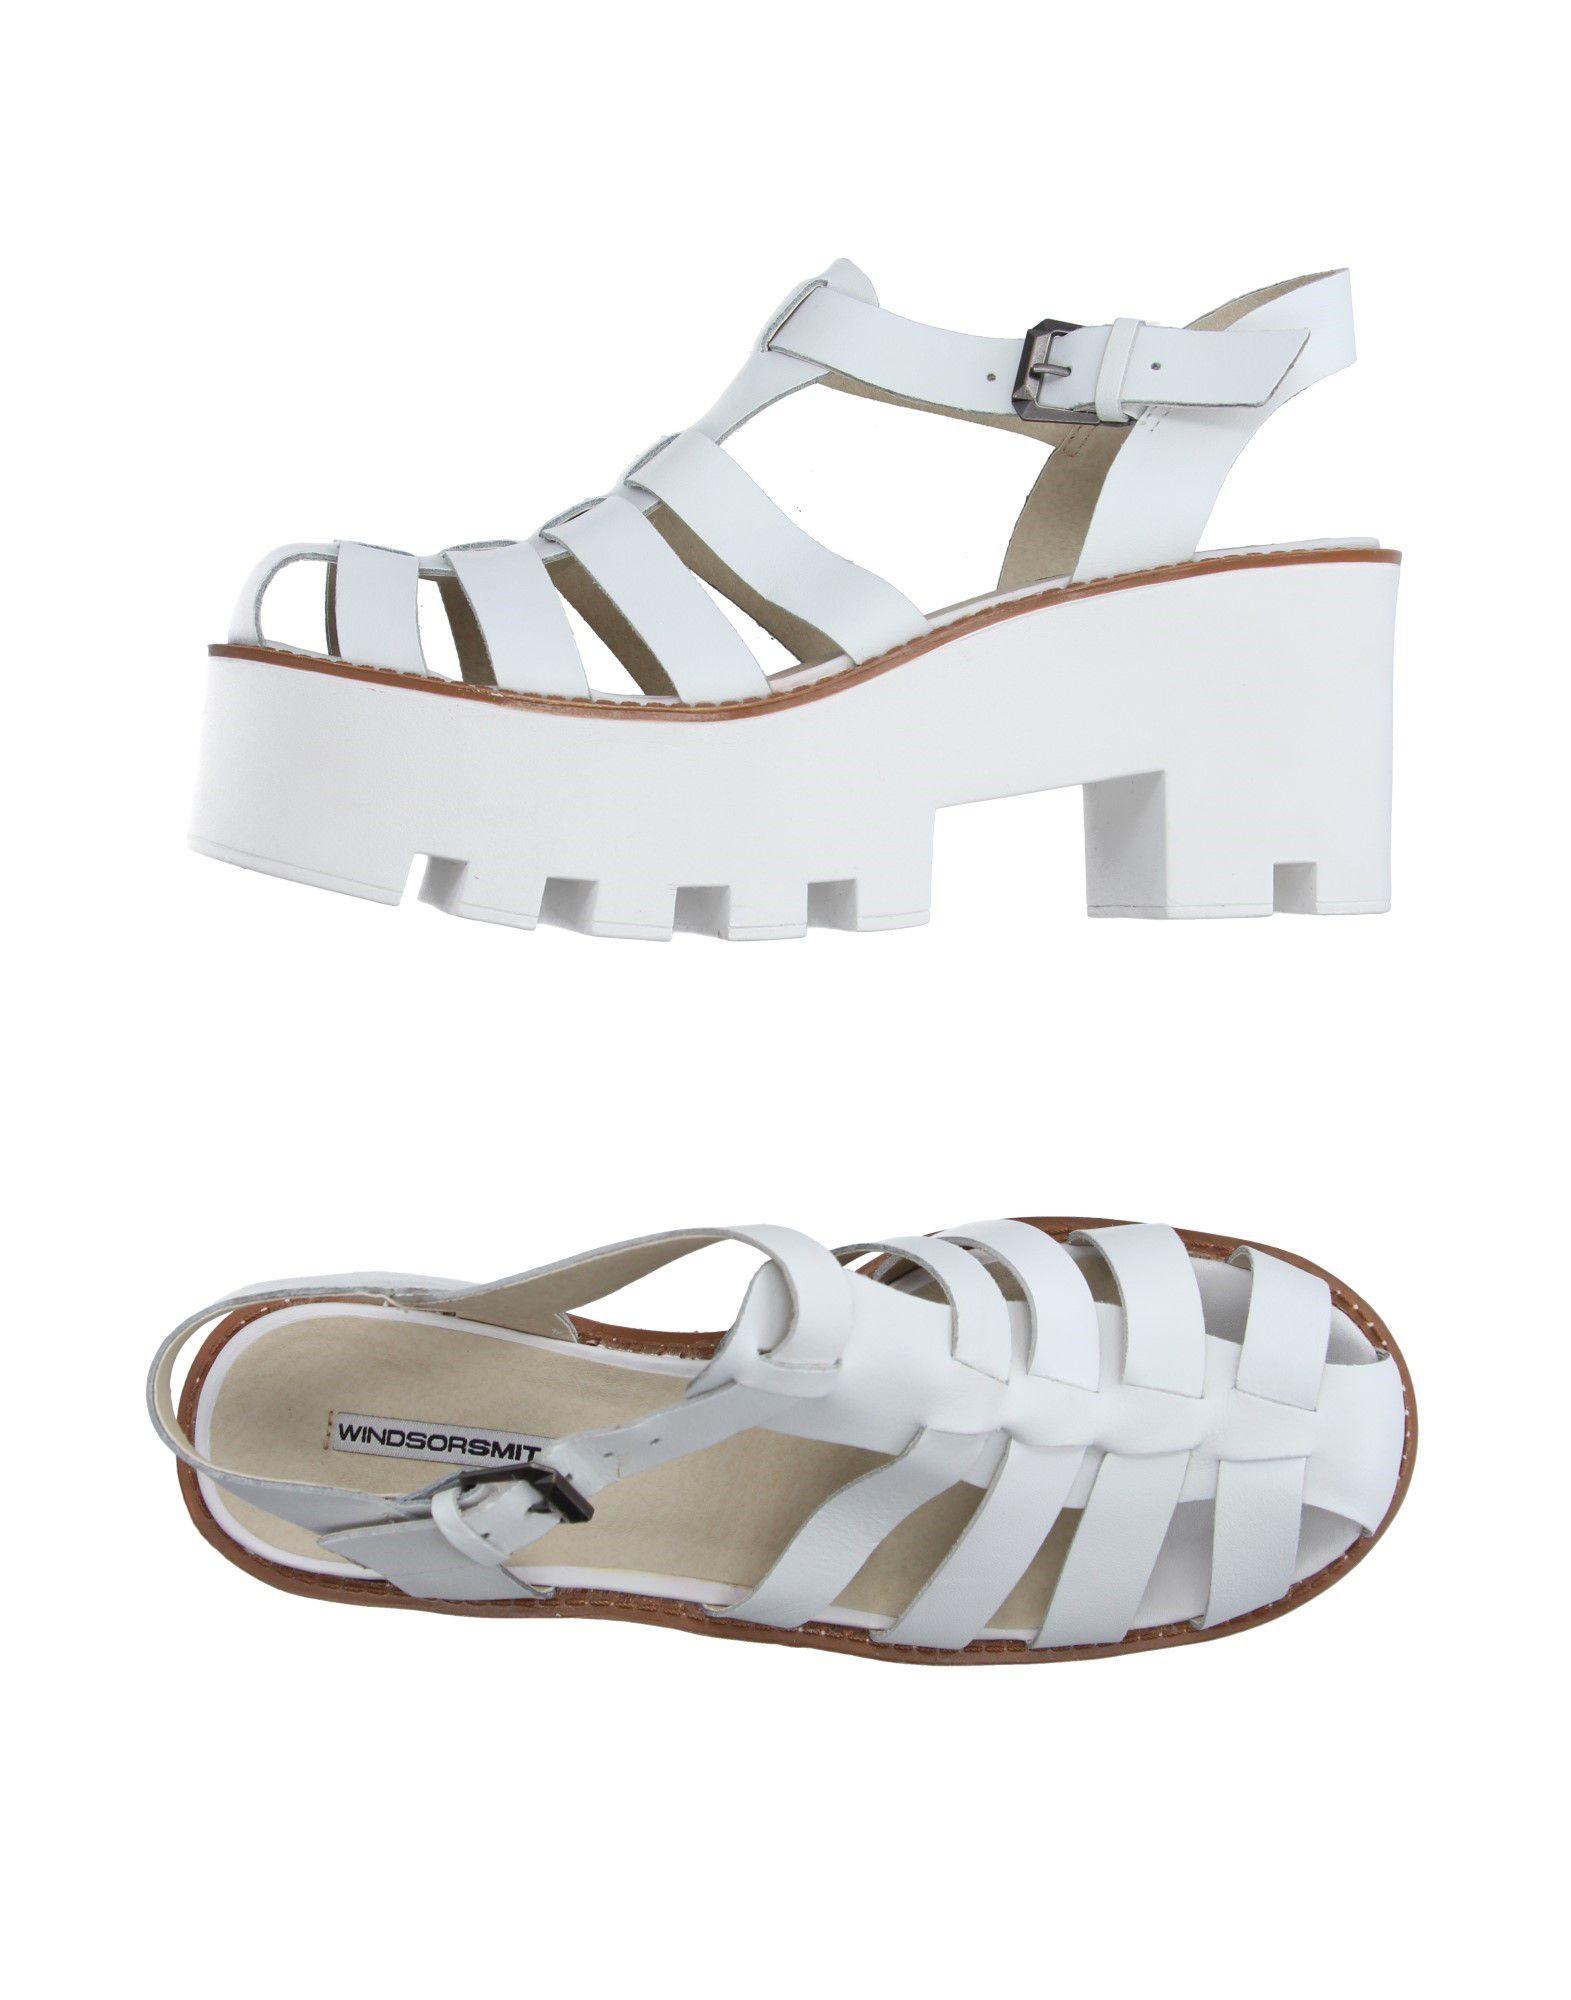 86c21788ea2 Windsor Smith Sandals - Women Windsor Smith Sandals online on YOOX ...